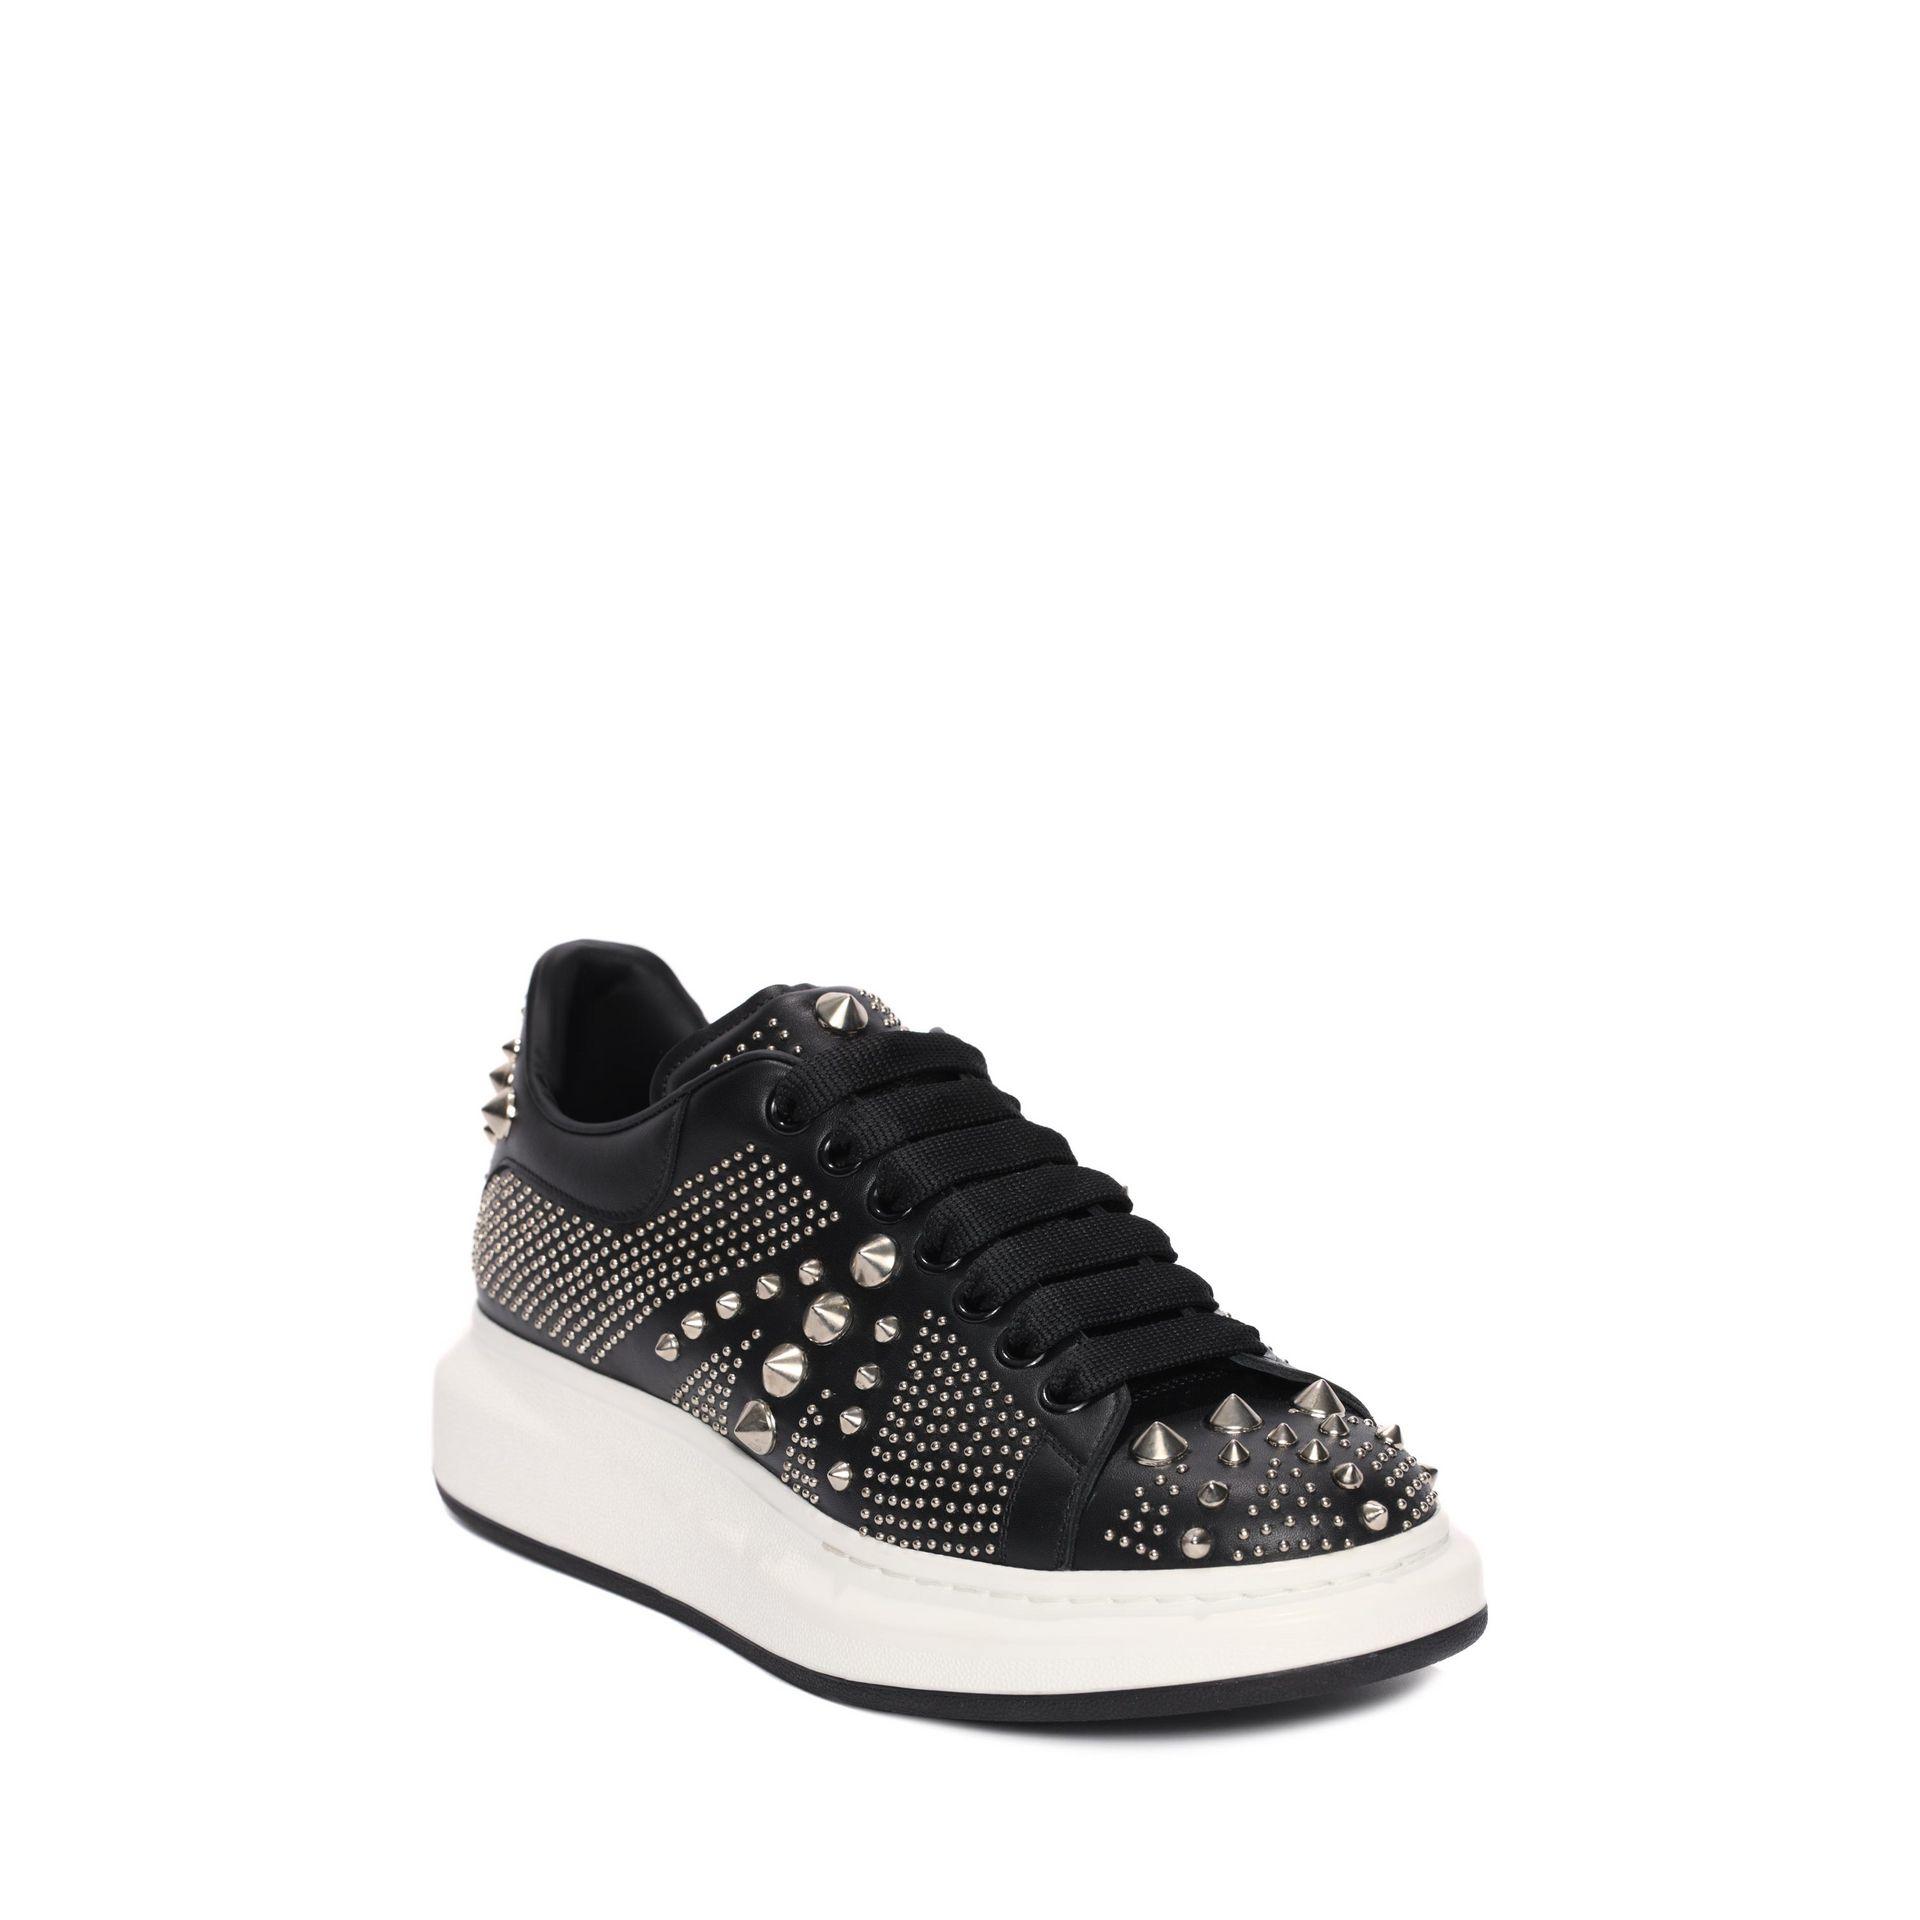 alexander mcqueen oversized sneaker in black lyst. Black Bedroom Furniture Sets. Home Design Ideas